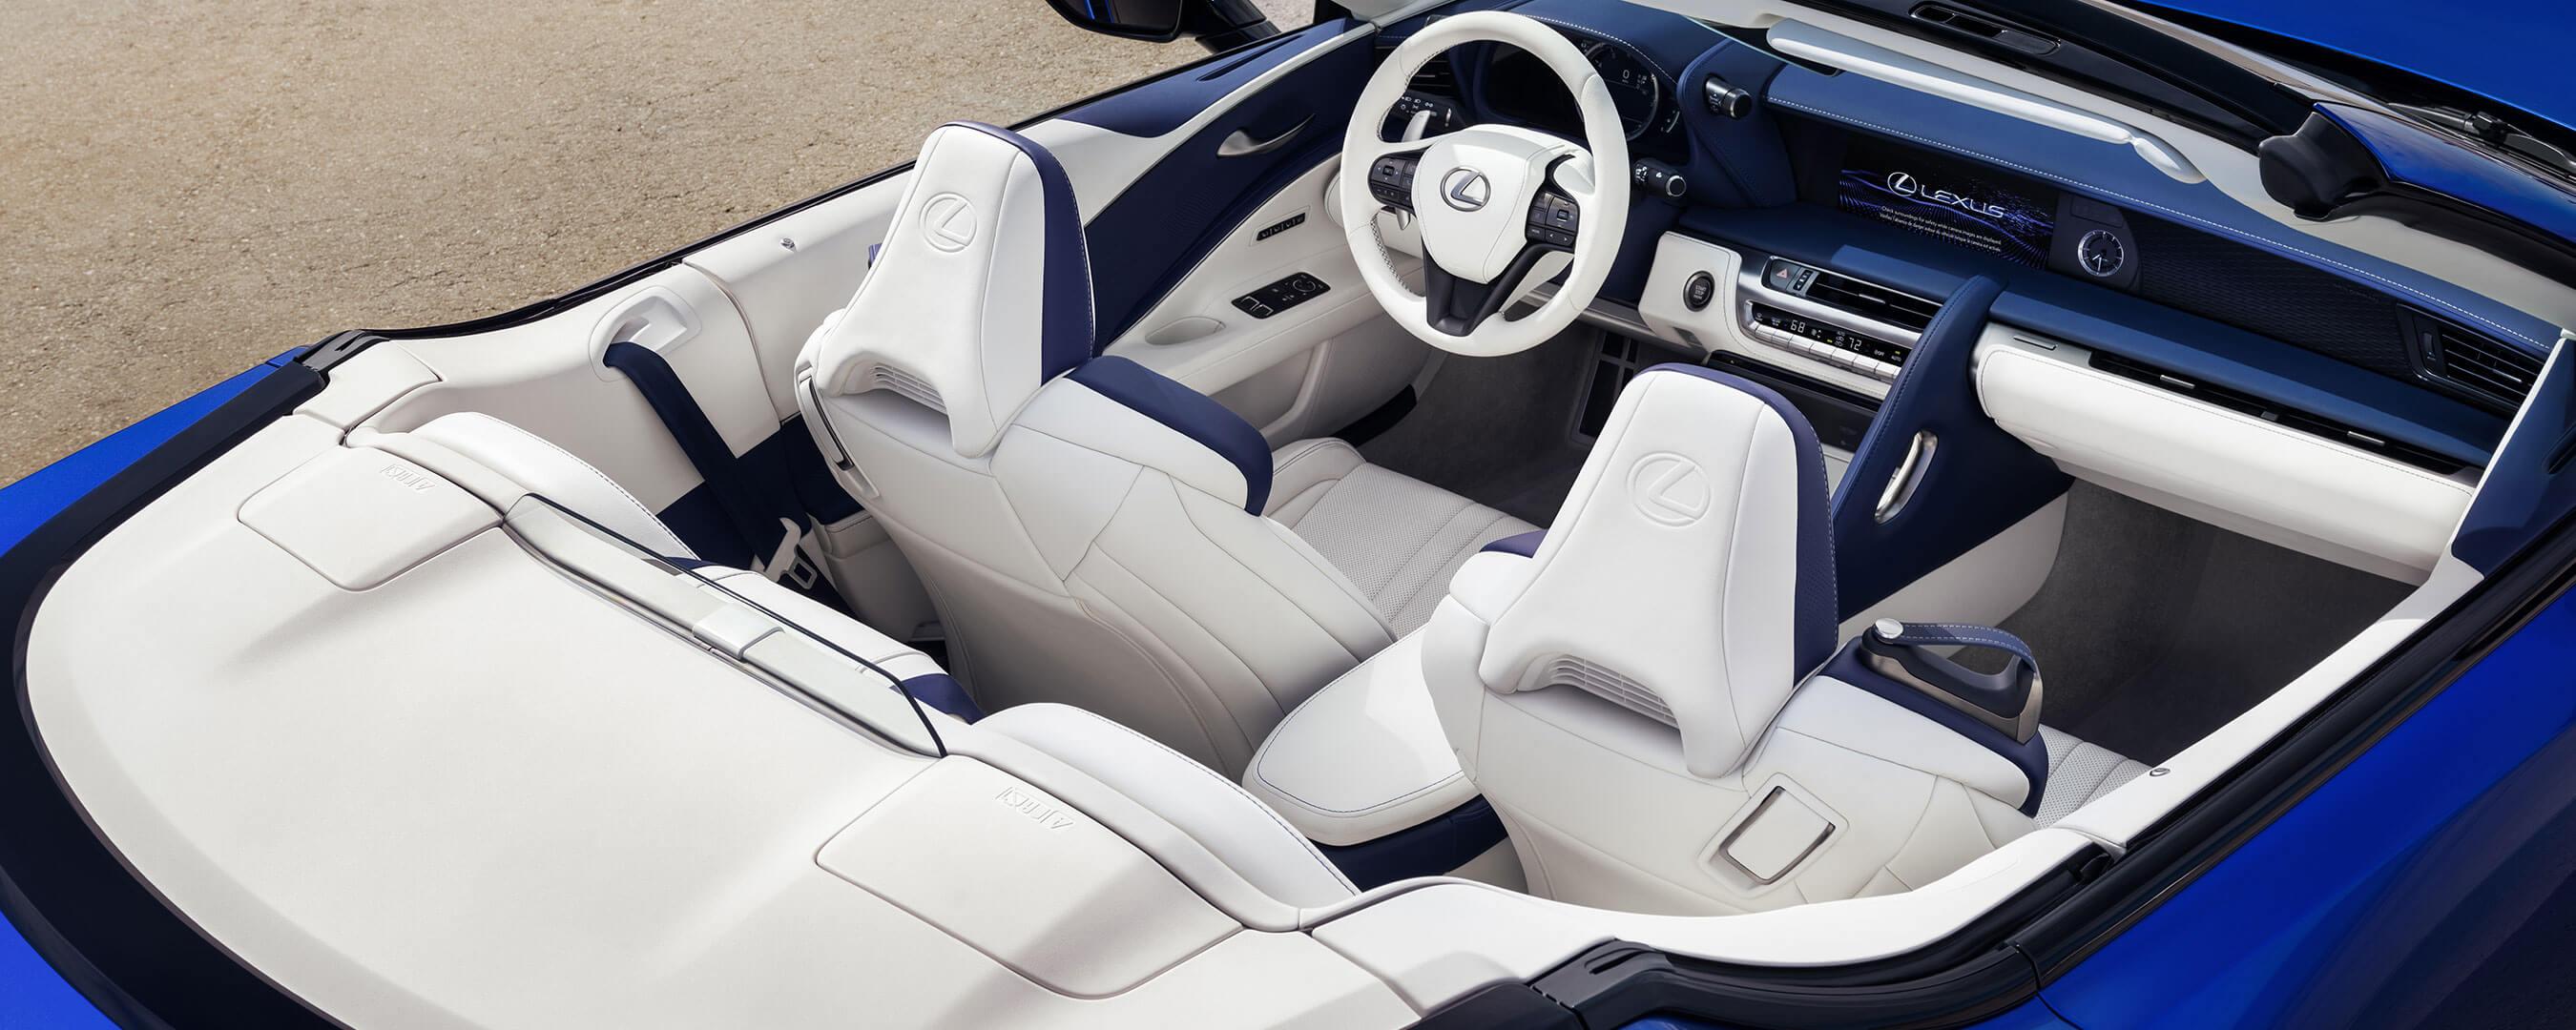 2020 lexus lc convertible experience interior back